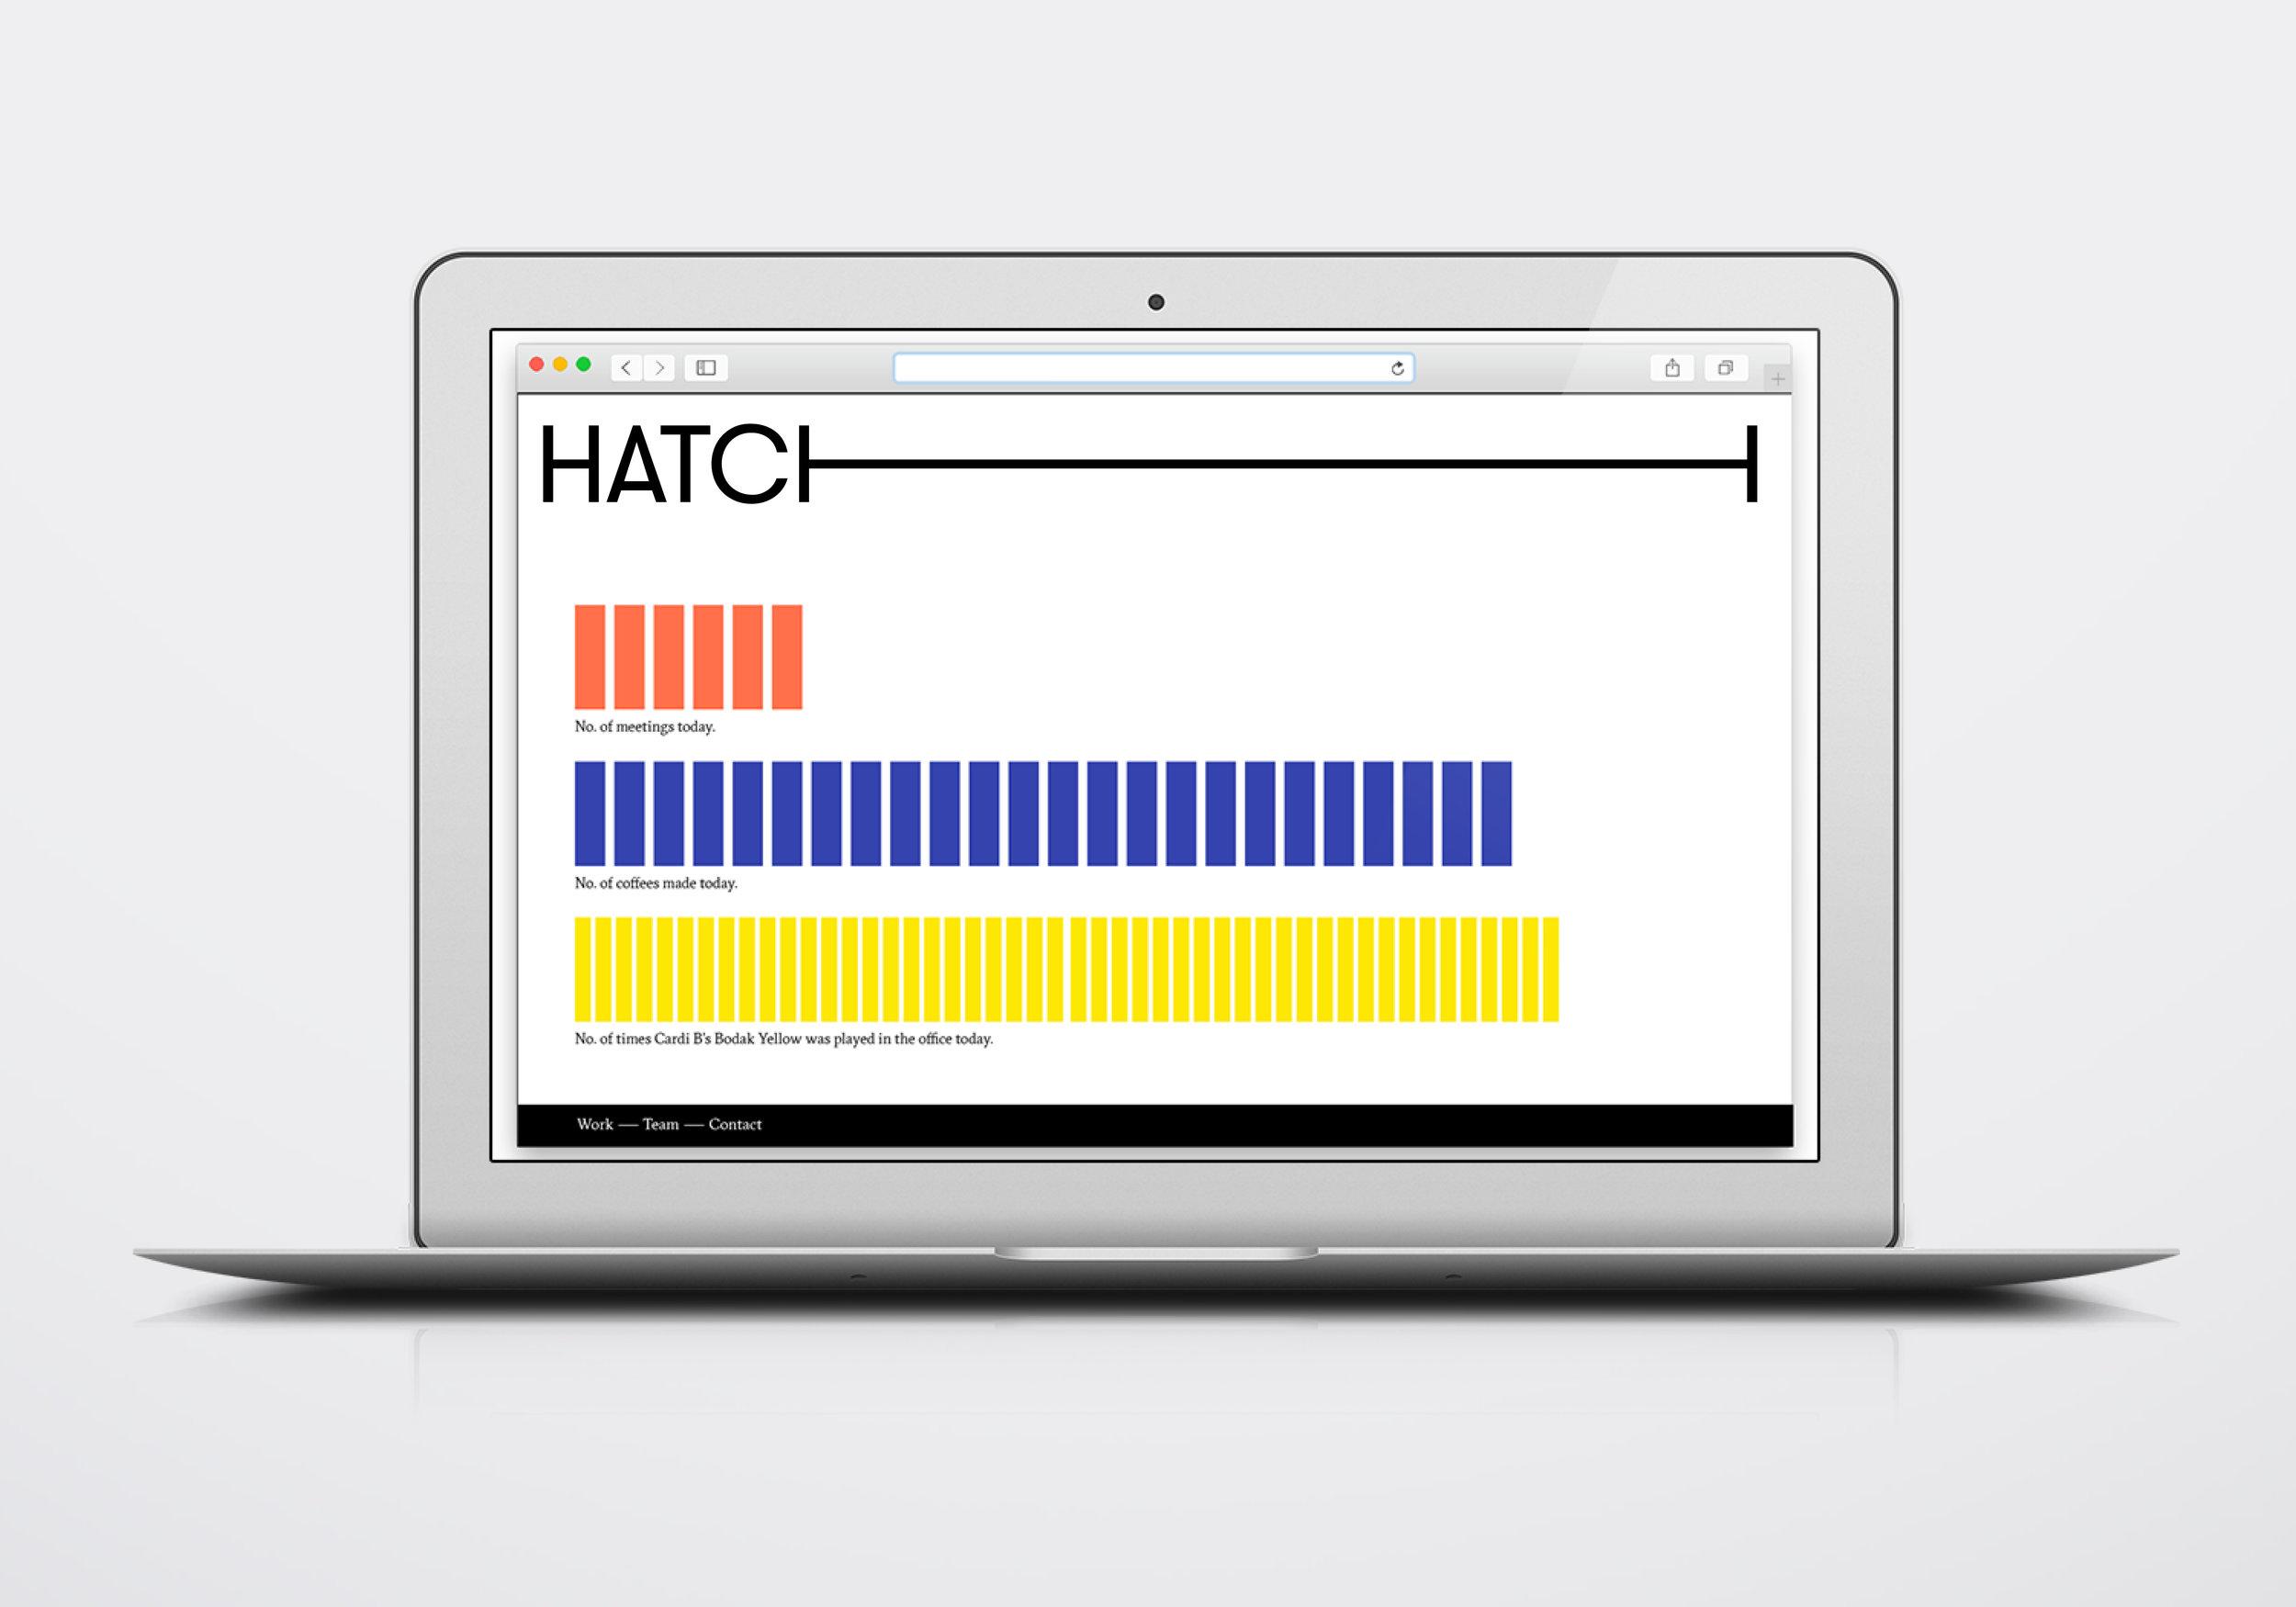 hatch-website-01.jpg